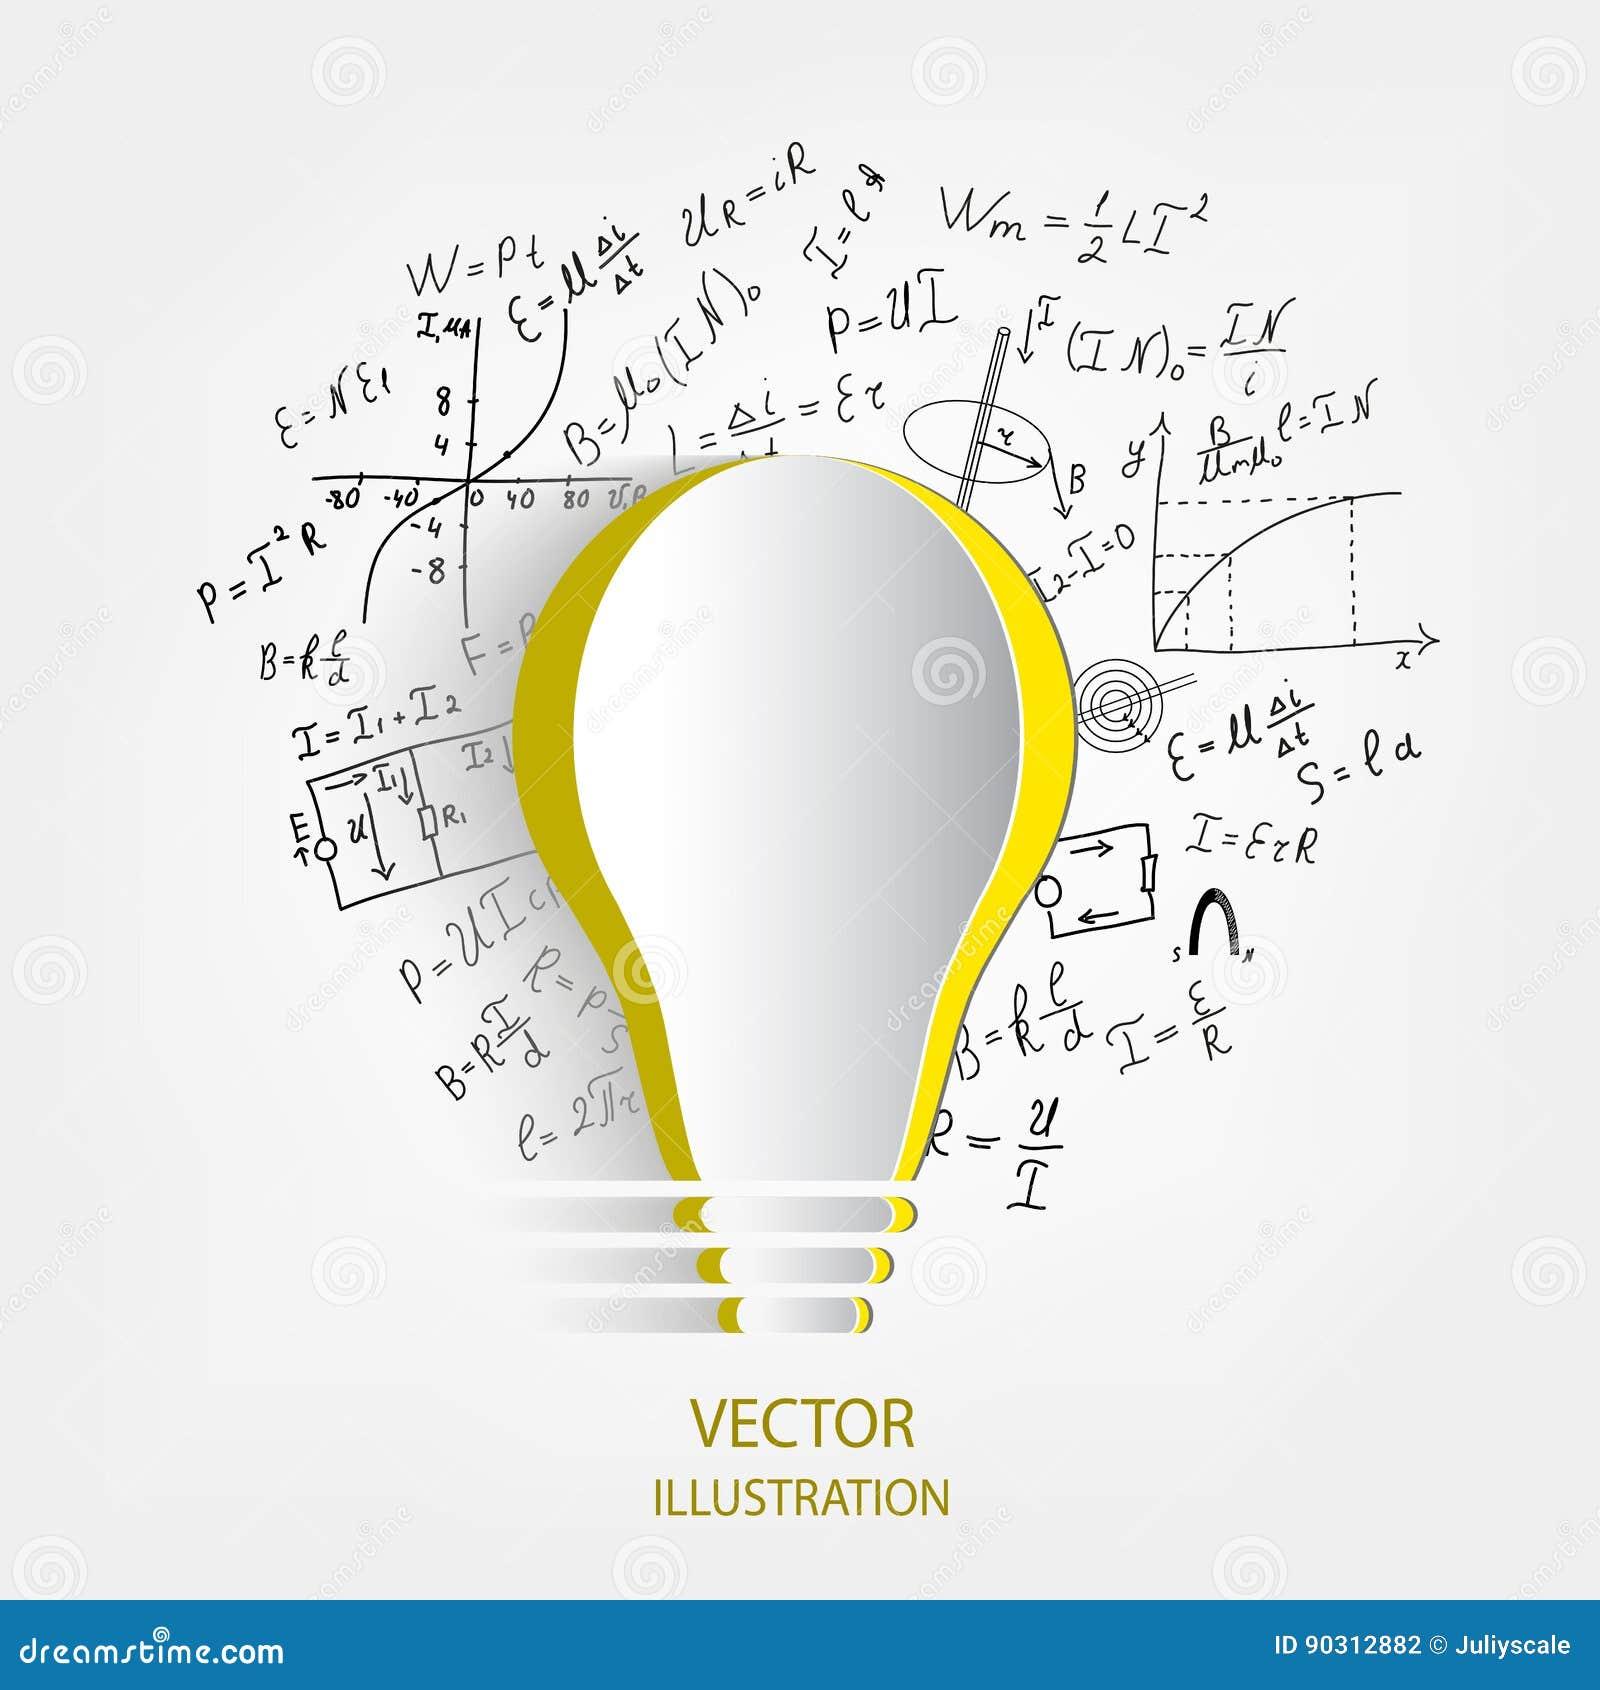 Mathematical Equations And Formulas Around The Light Bulb